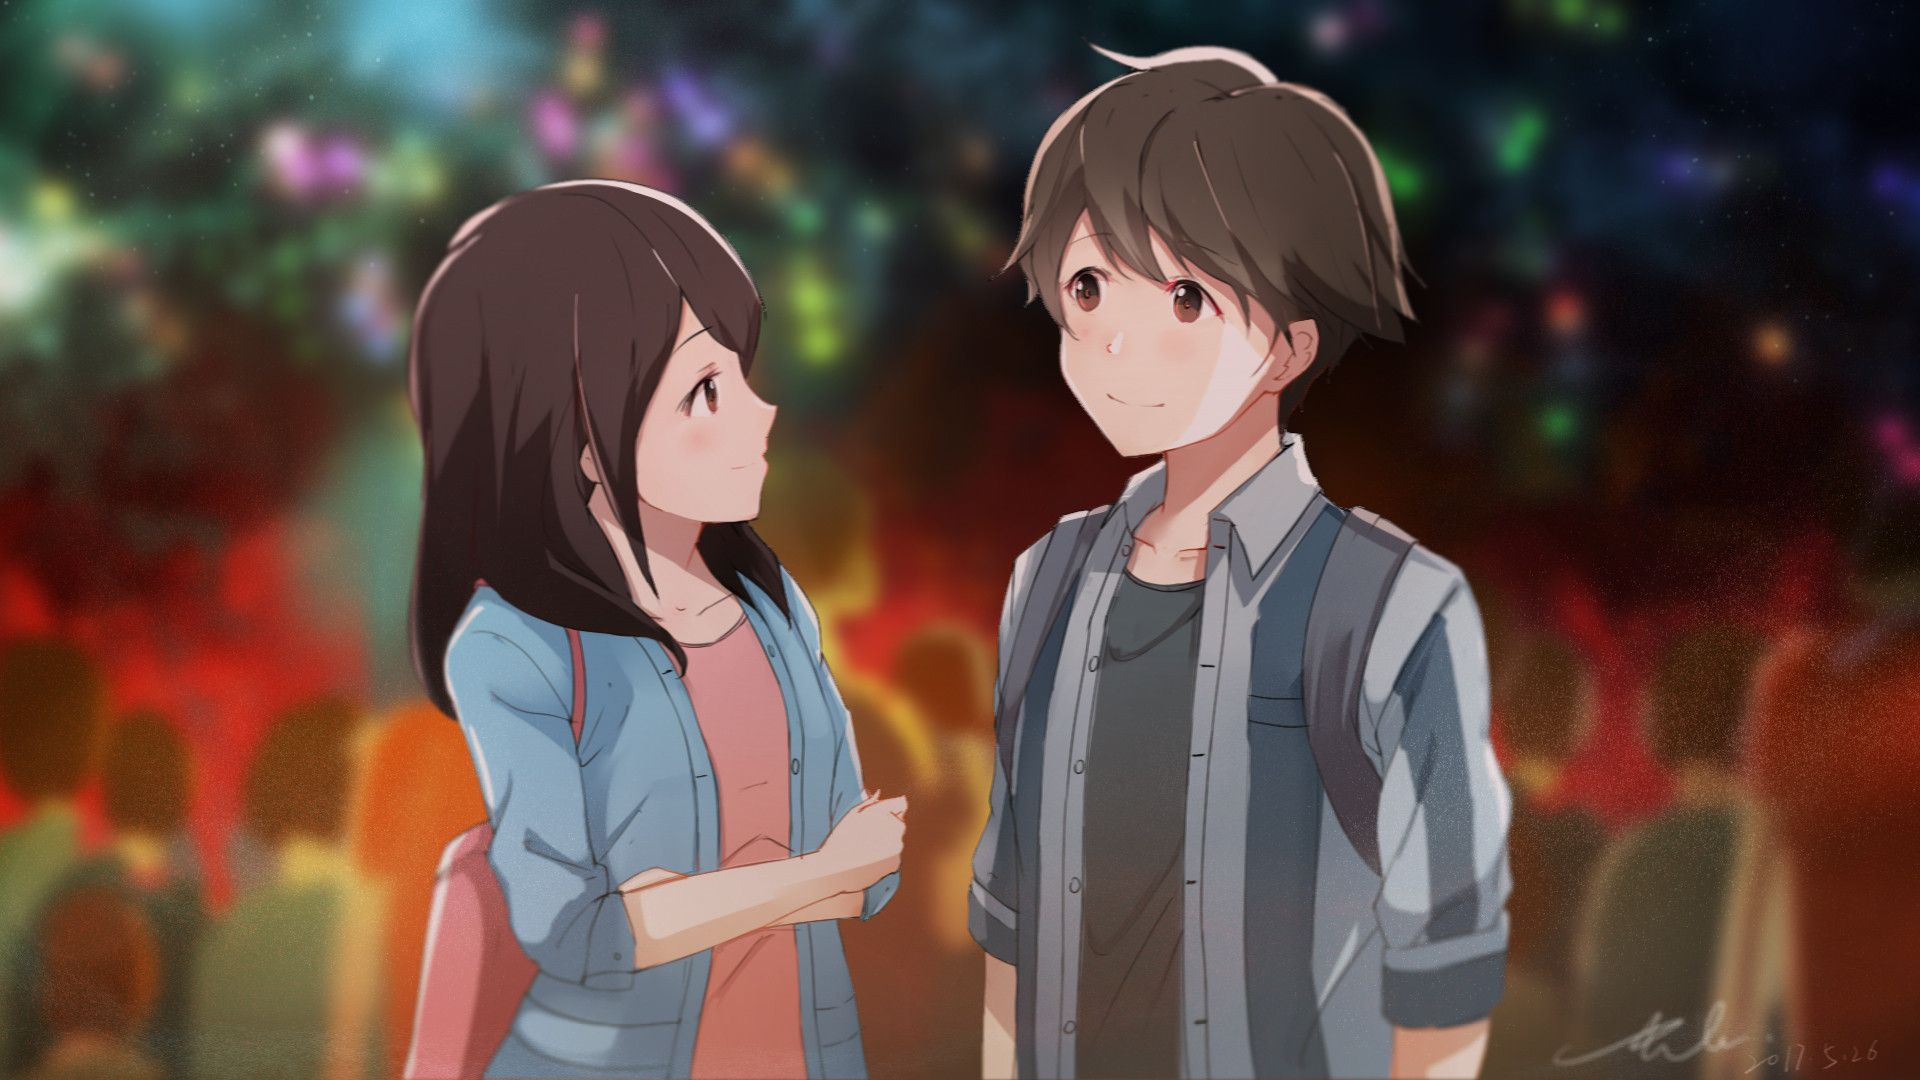 Imgur Anime romance, Anime, Anime wallpaper